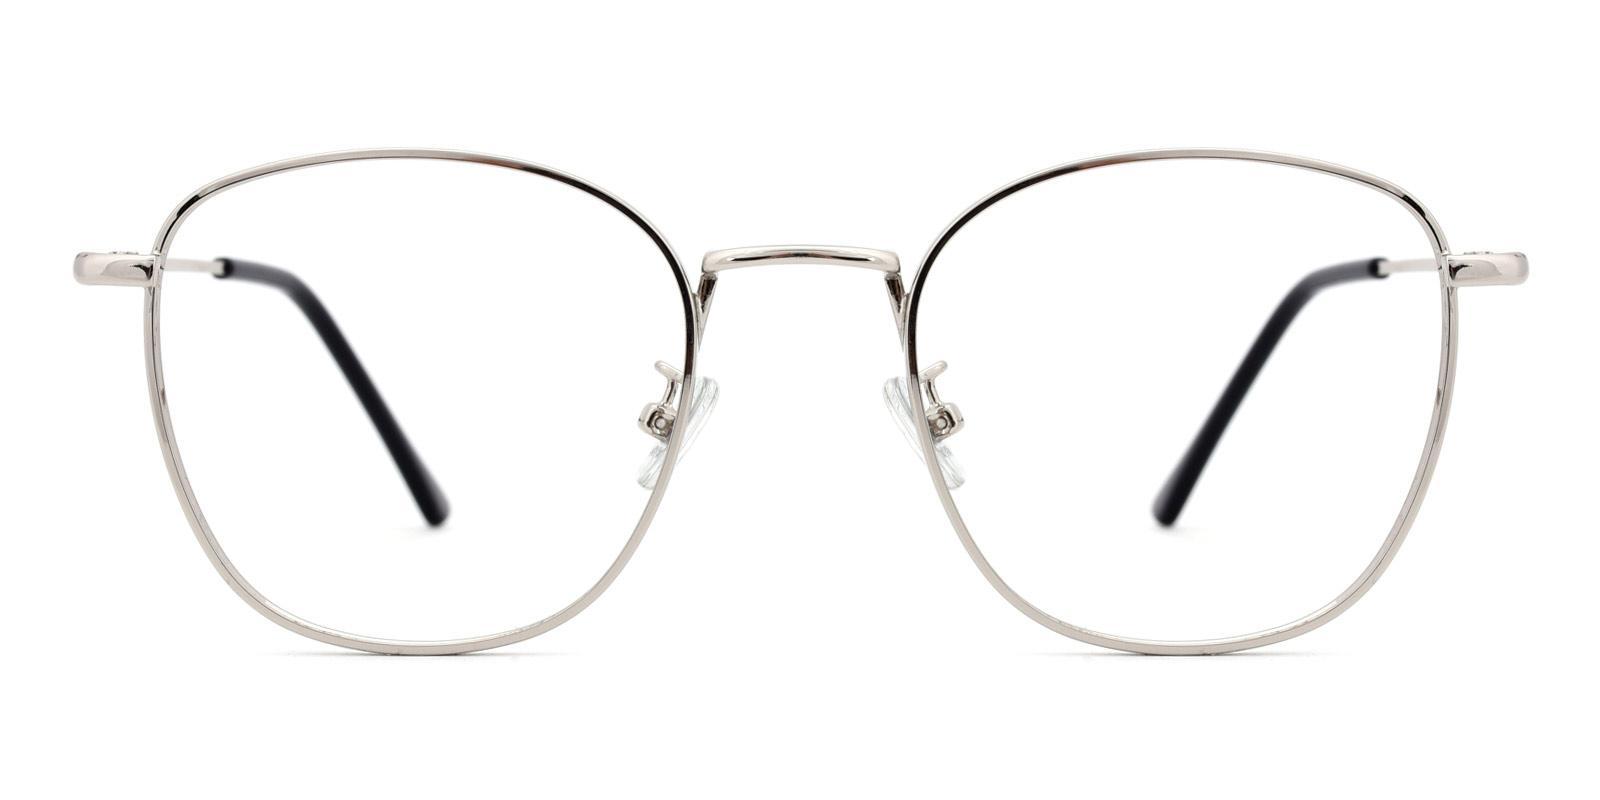 Richard-Silver-Square-Metal-Eyeglasses-detail